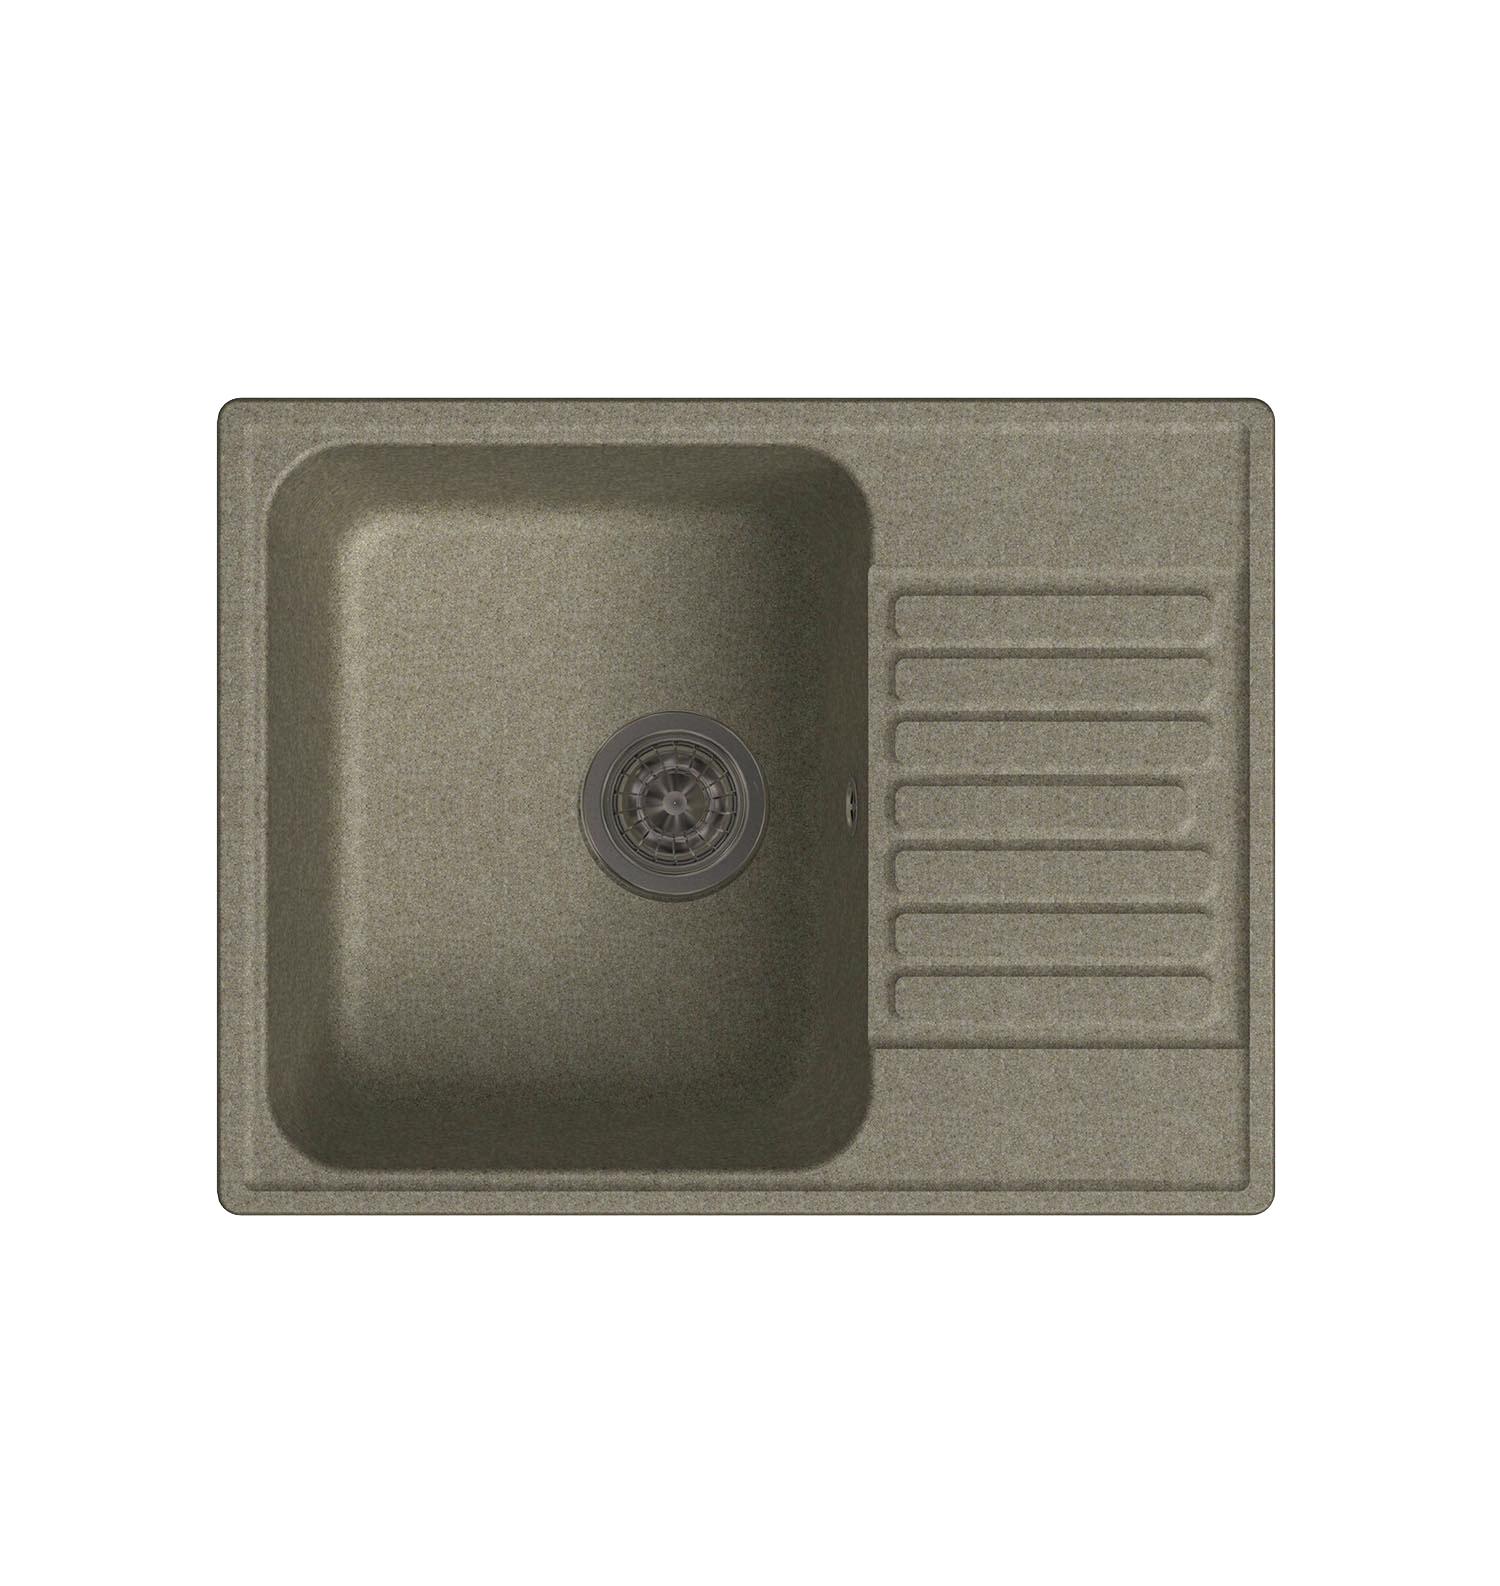 LEX Garda 620 Sand кухонная мойка lex garda 620 black черный